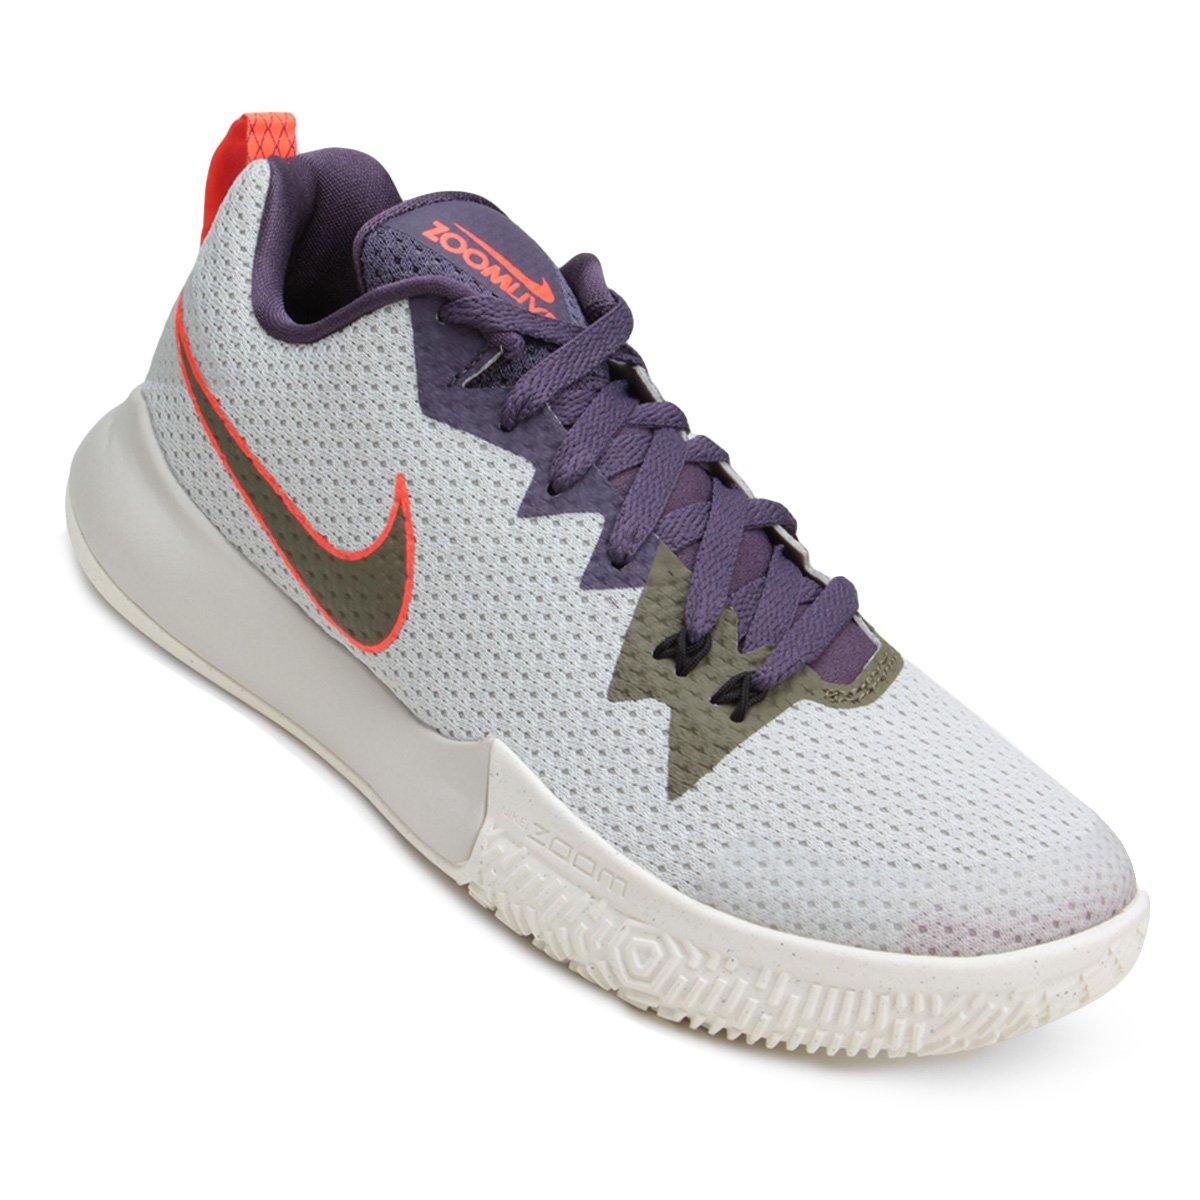 c2a9919e123 Tênis Nike Zoom Live II Masculino - Branco e Roxo - Compre Agora ...